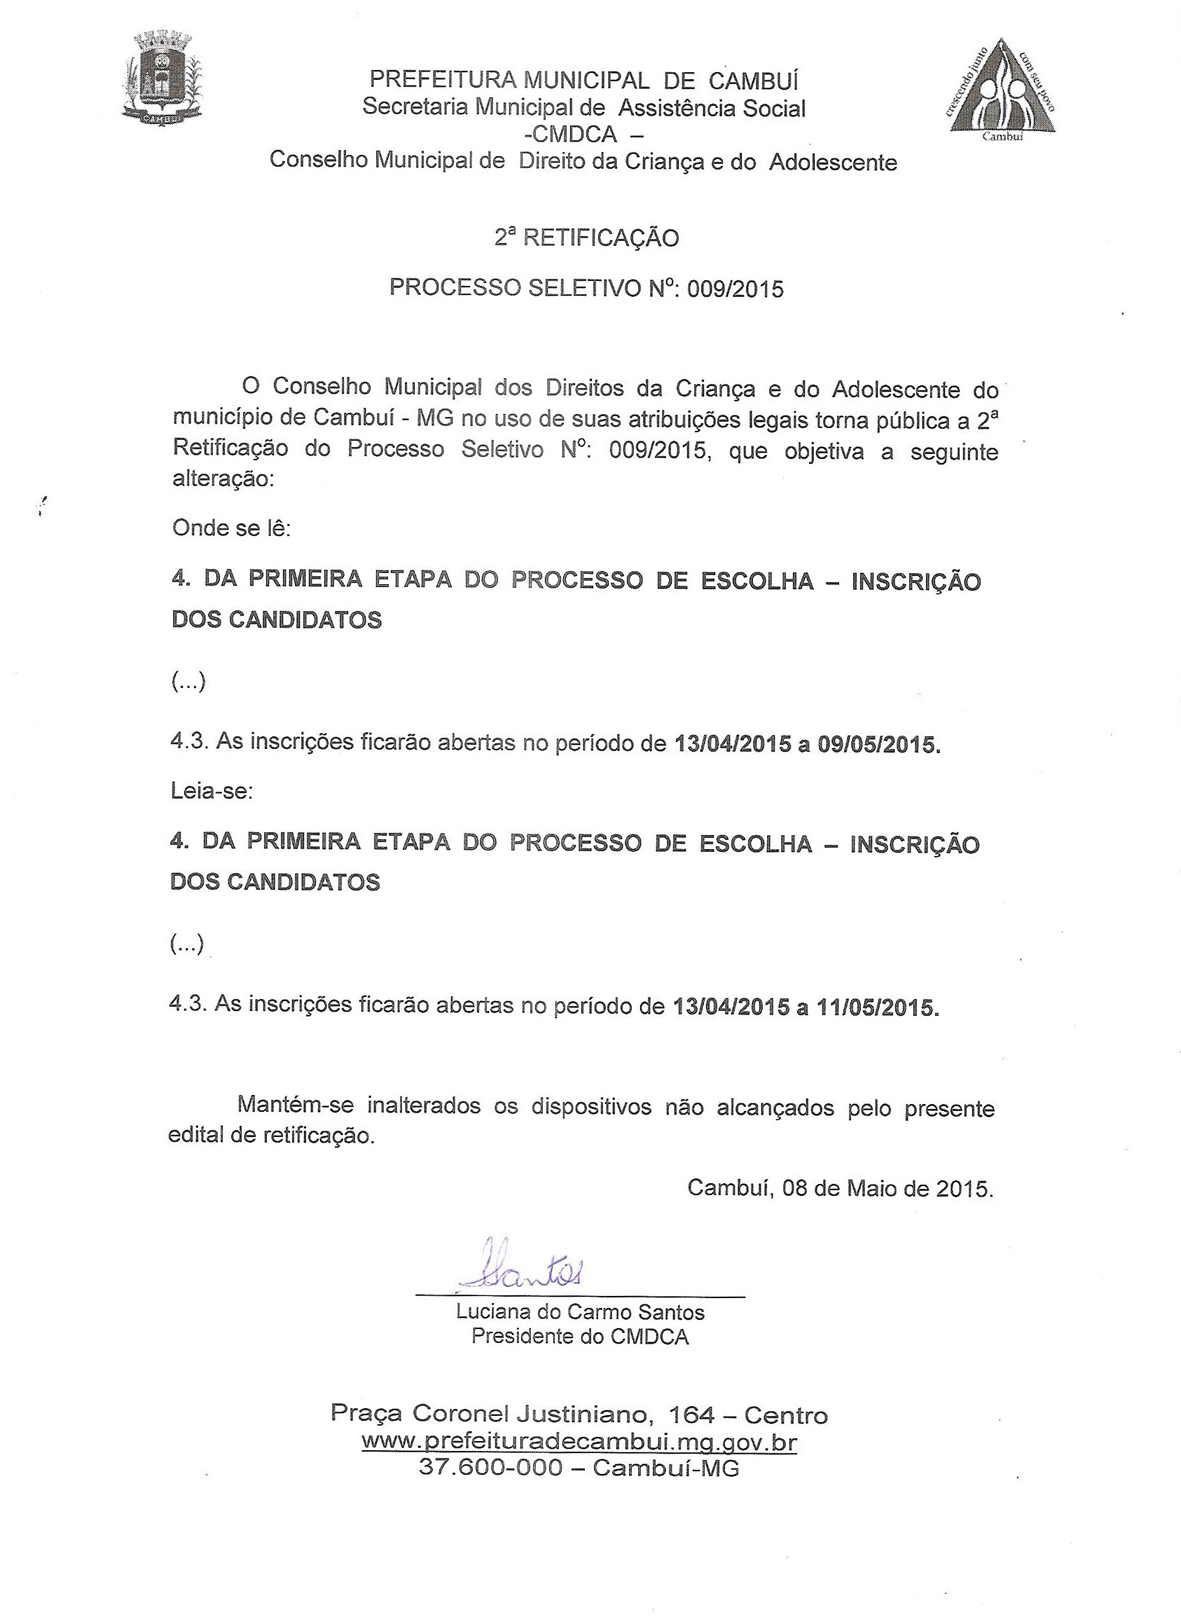 RETIFICAO EDITAL 001